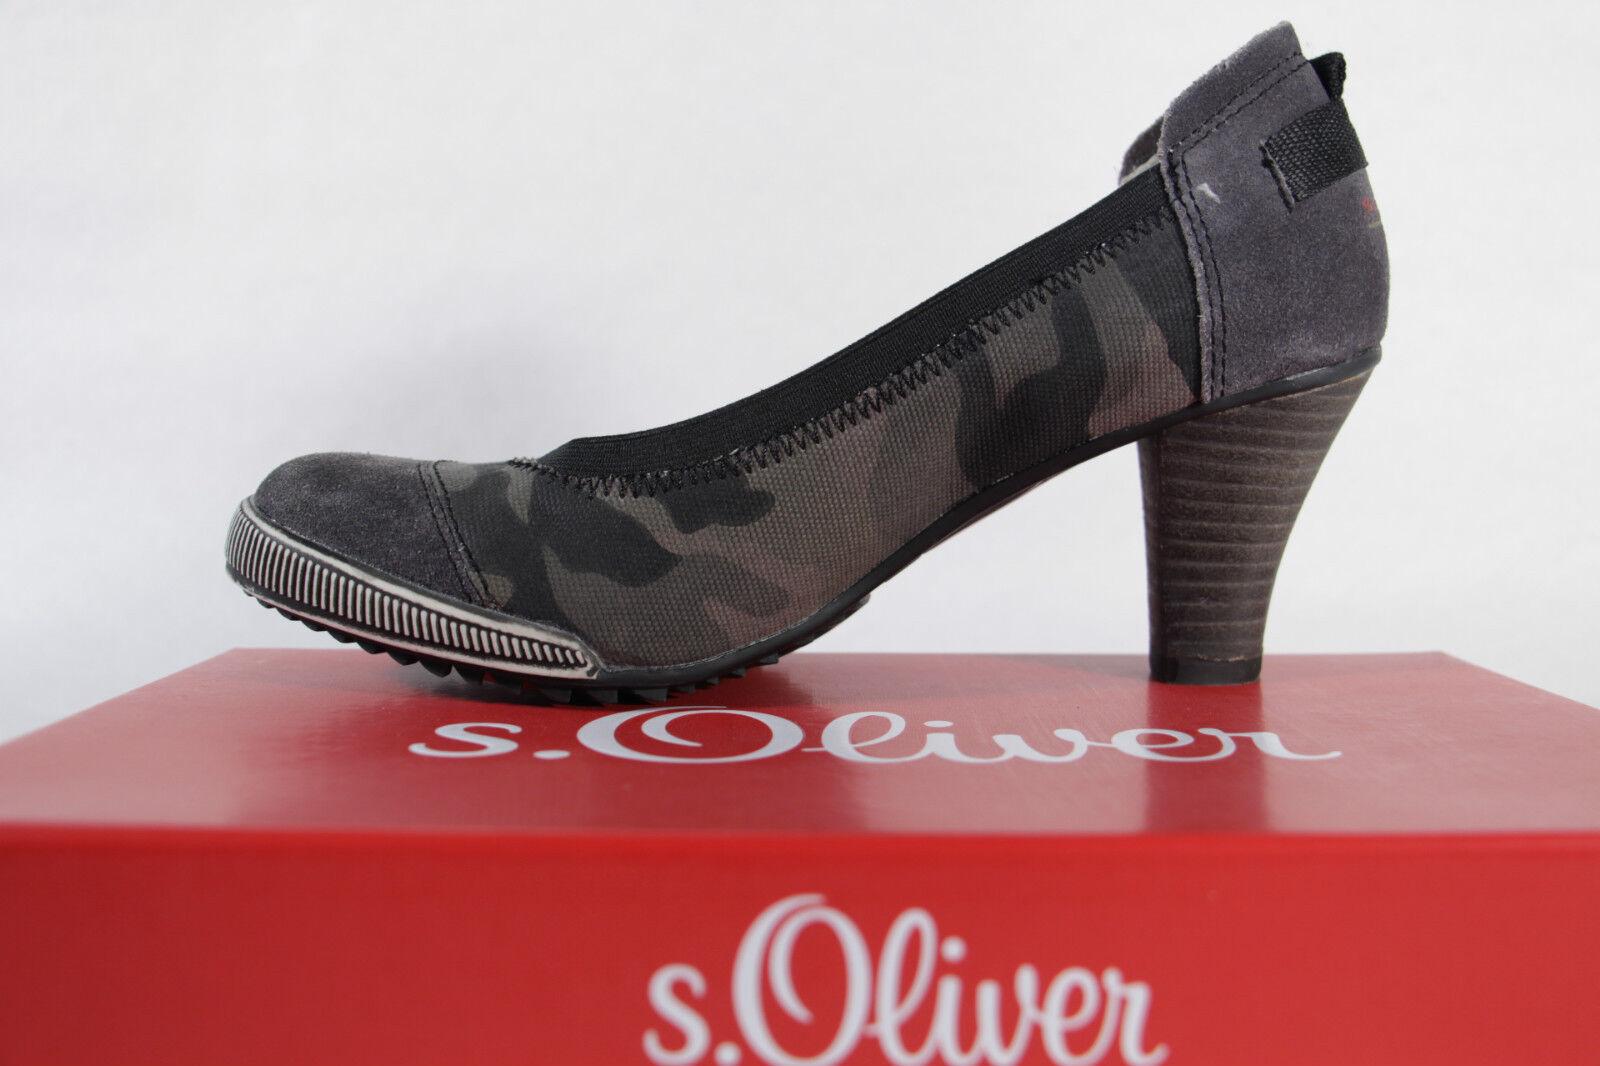 S.Oliver  Damen Pumps Slipper  S.Oliver oliv,  Lederinnensohle, NEU dc8c19